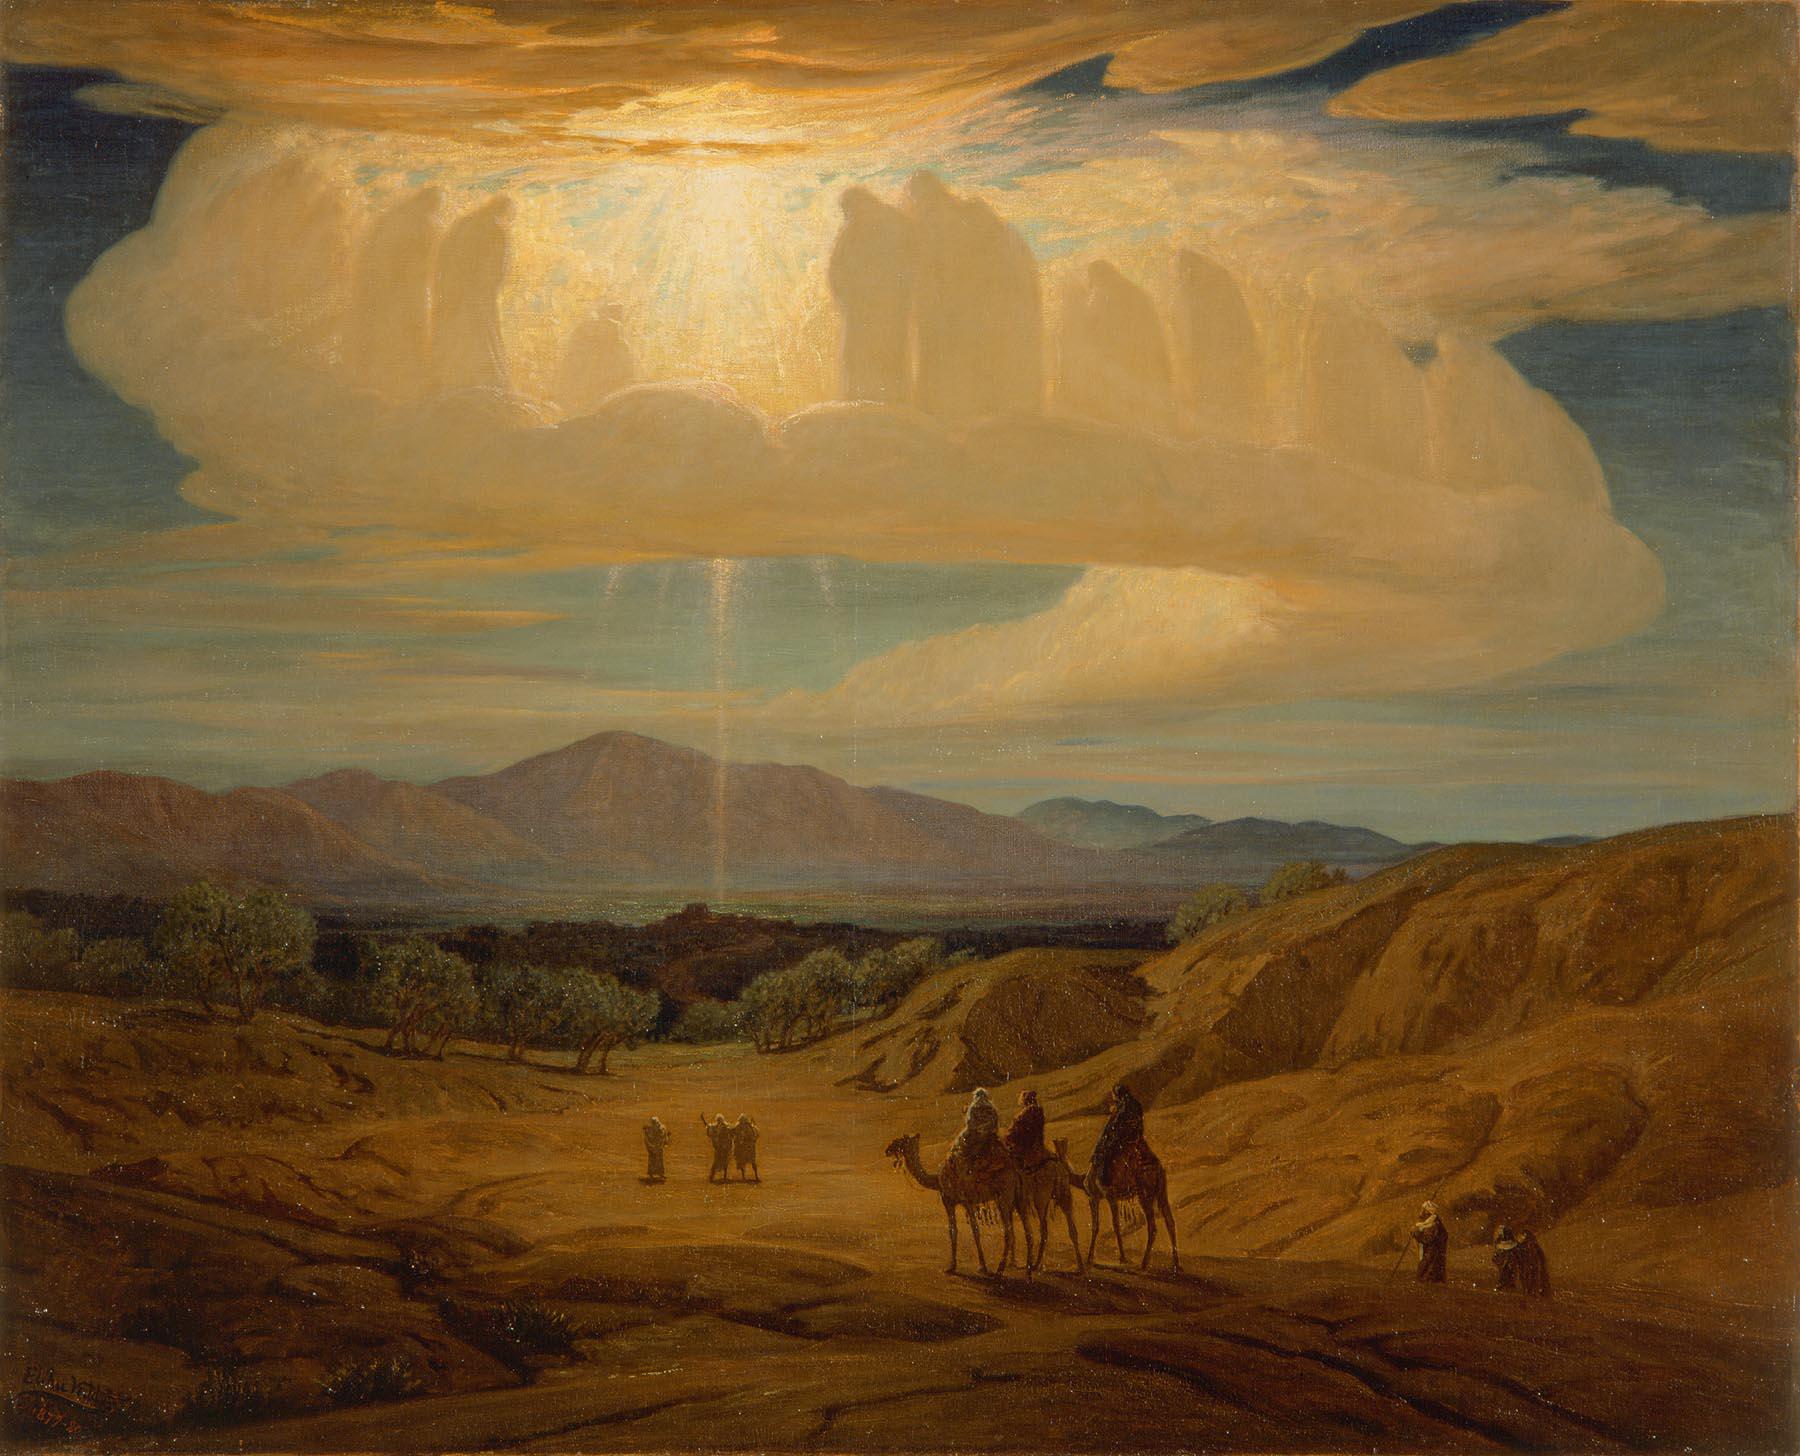 Elihu Vedder (American, 1836–1923) Star of Bethlehem, 1879–80 .  Oil on canvas; 36 3/16 x 44 3/4 in. Milwaukee Art Museum, Gift of Mrs. Montgomery Sears, M1925.2